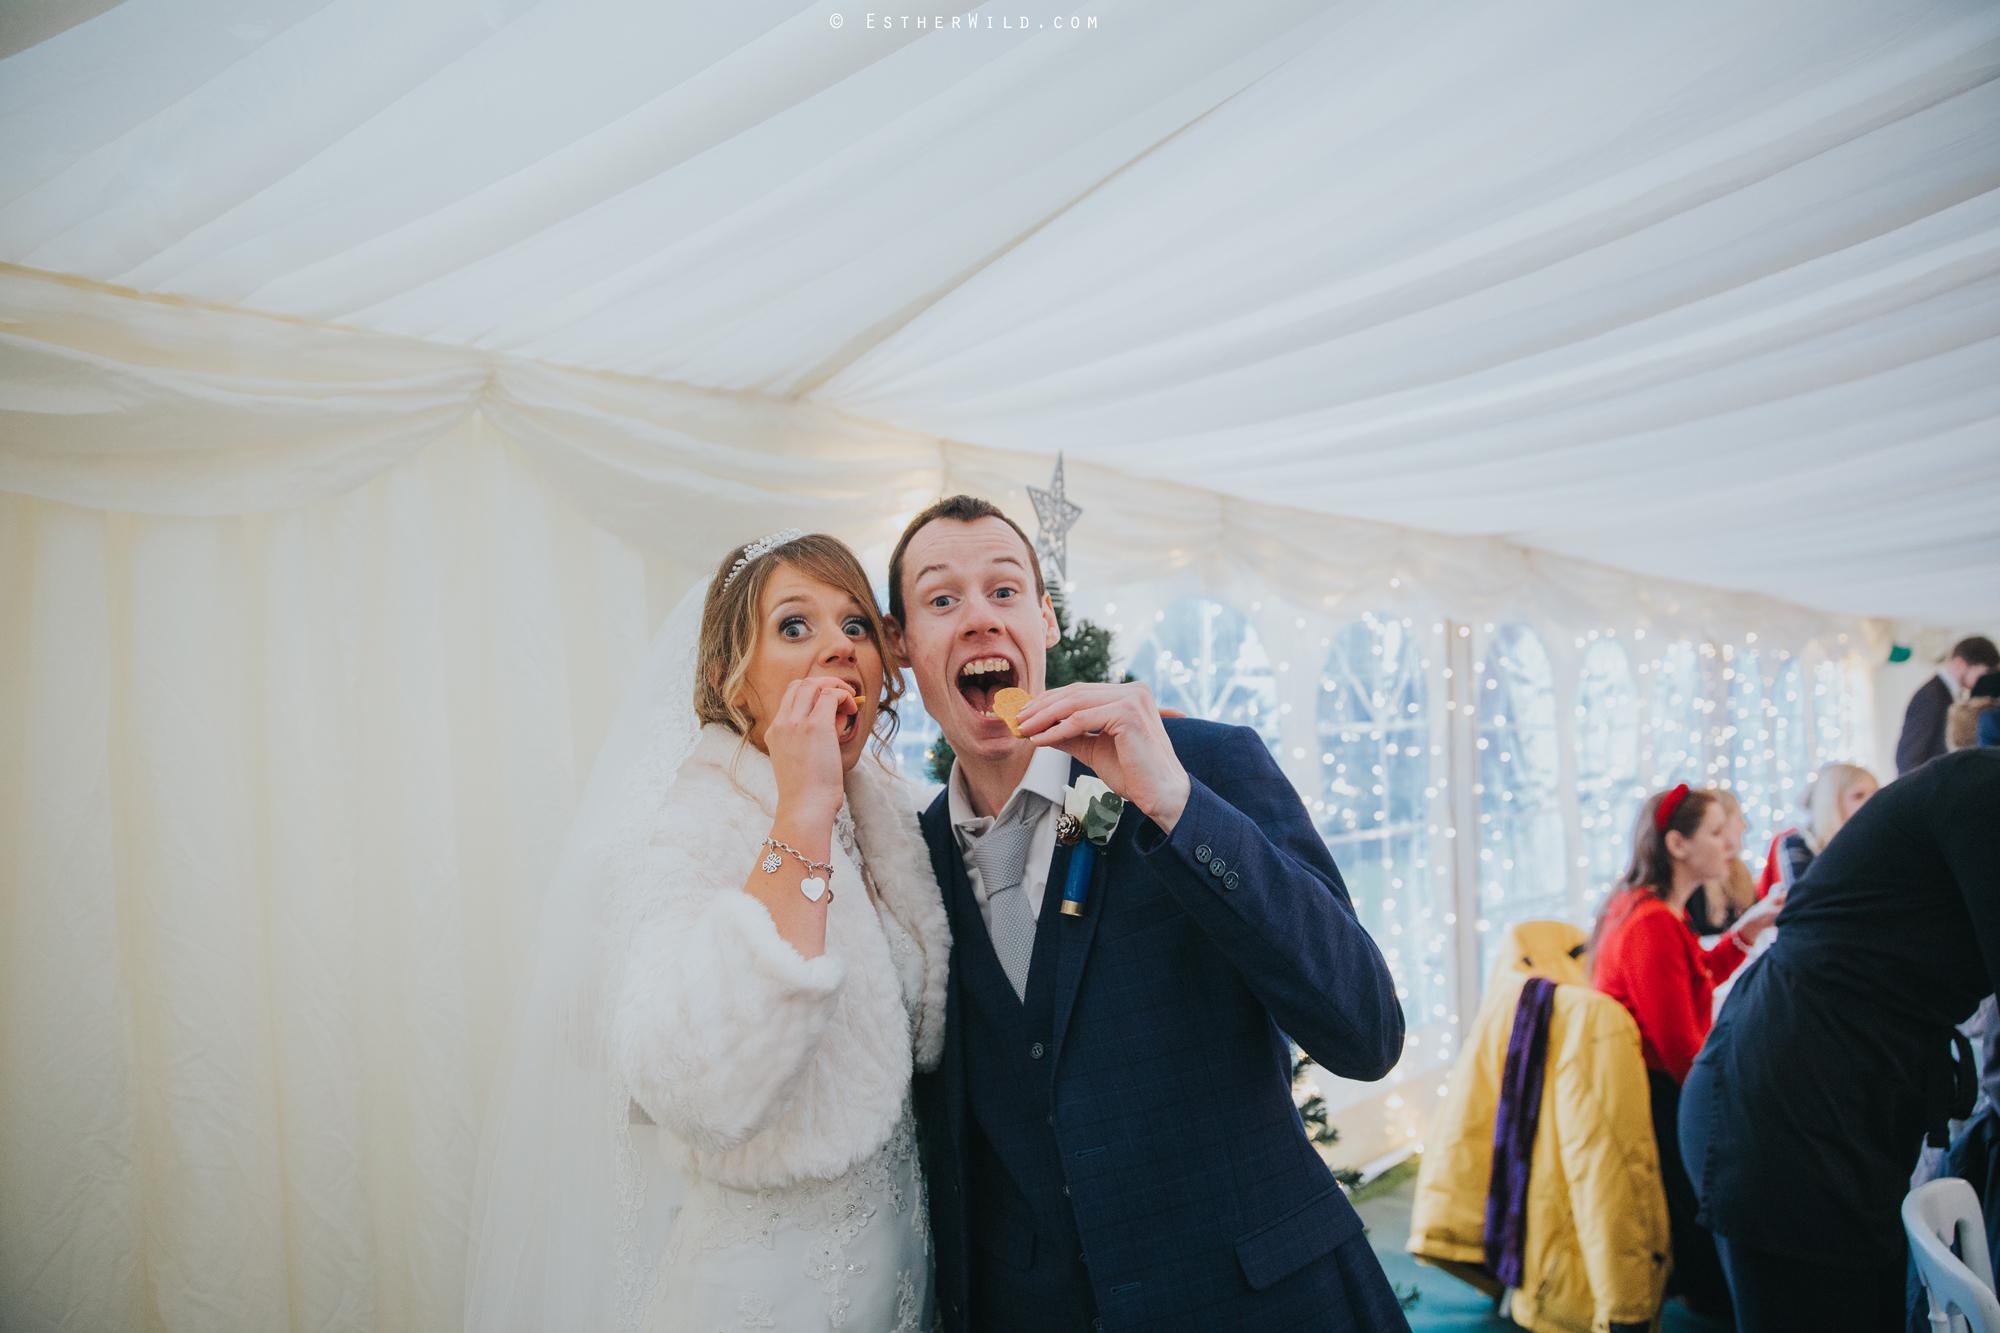 Wedding_Photography_Diss_Gawdy_Hall_Redenhall_Church_Norfolk_Winter_Esther_Wild_Copyright_IMG_1737.jpg